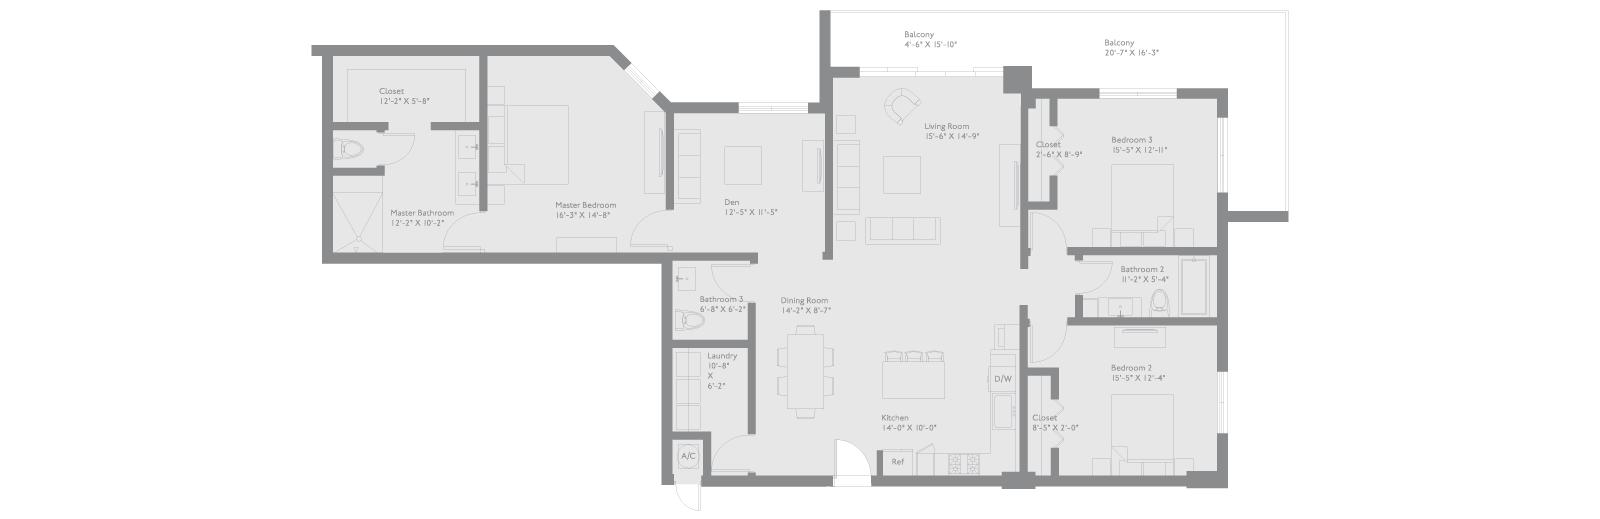 Arbor Floor Plan F 12 15 17